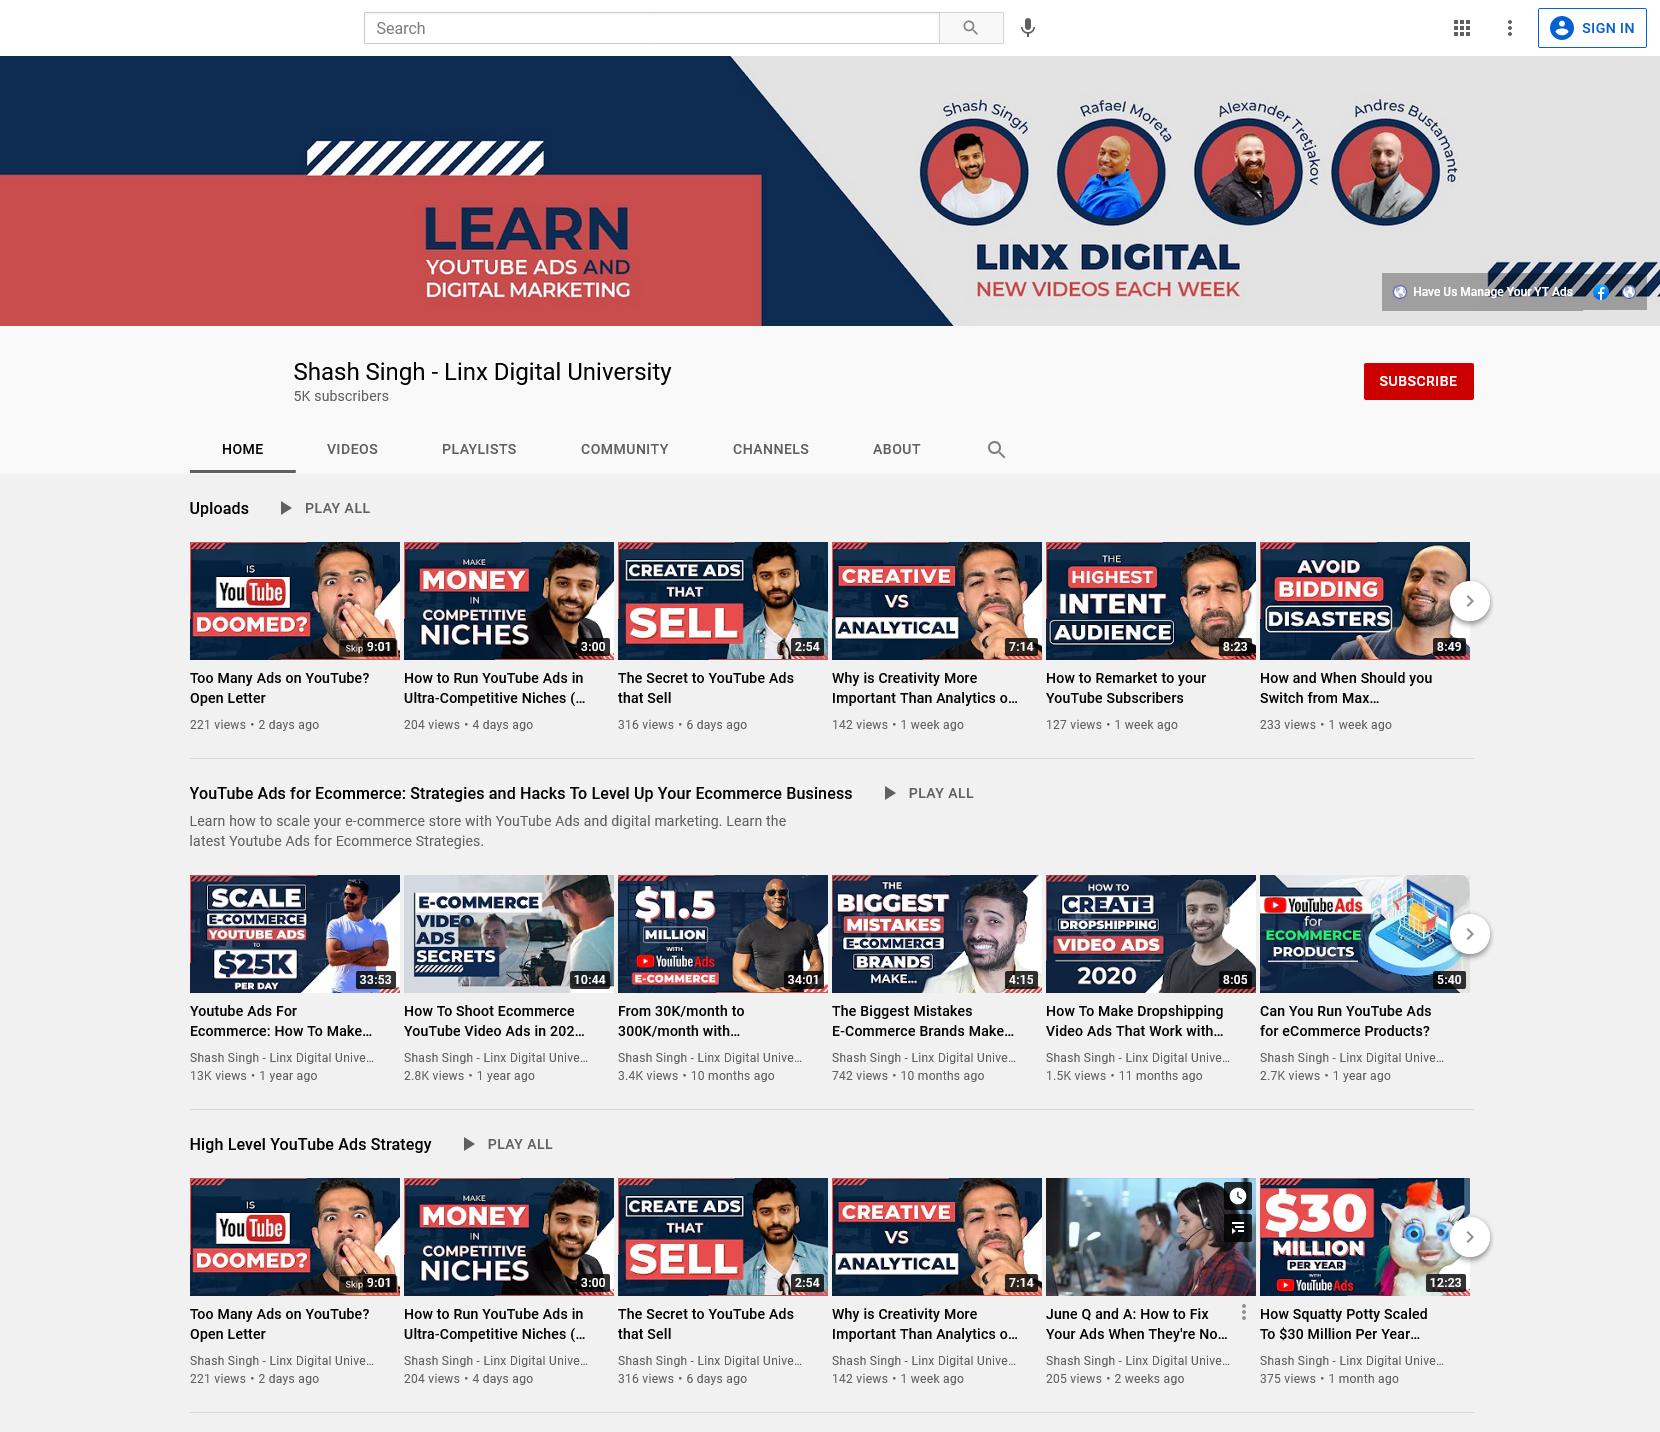 Linx Digital YouTube Channel